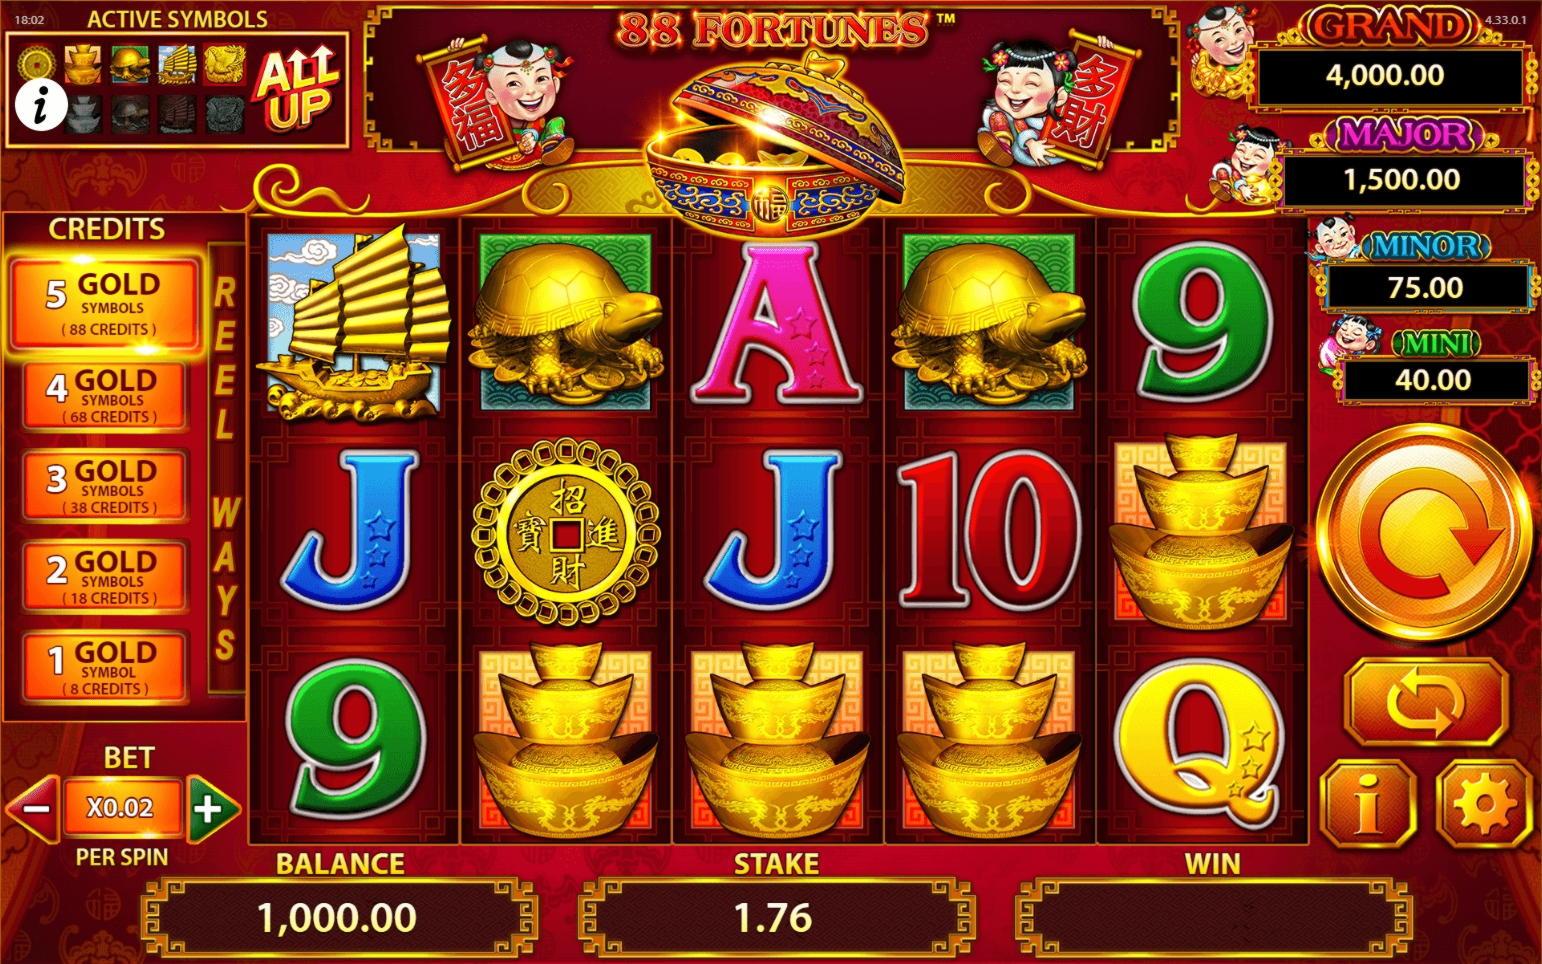 $655 FREE CHIP CASINO at Sloty Casino